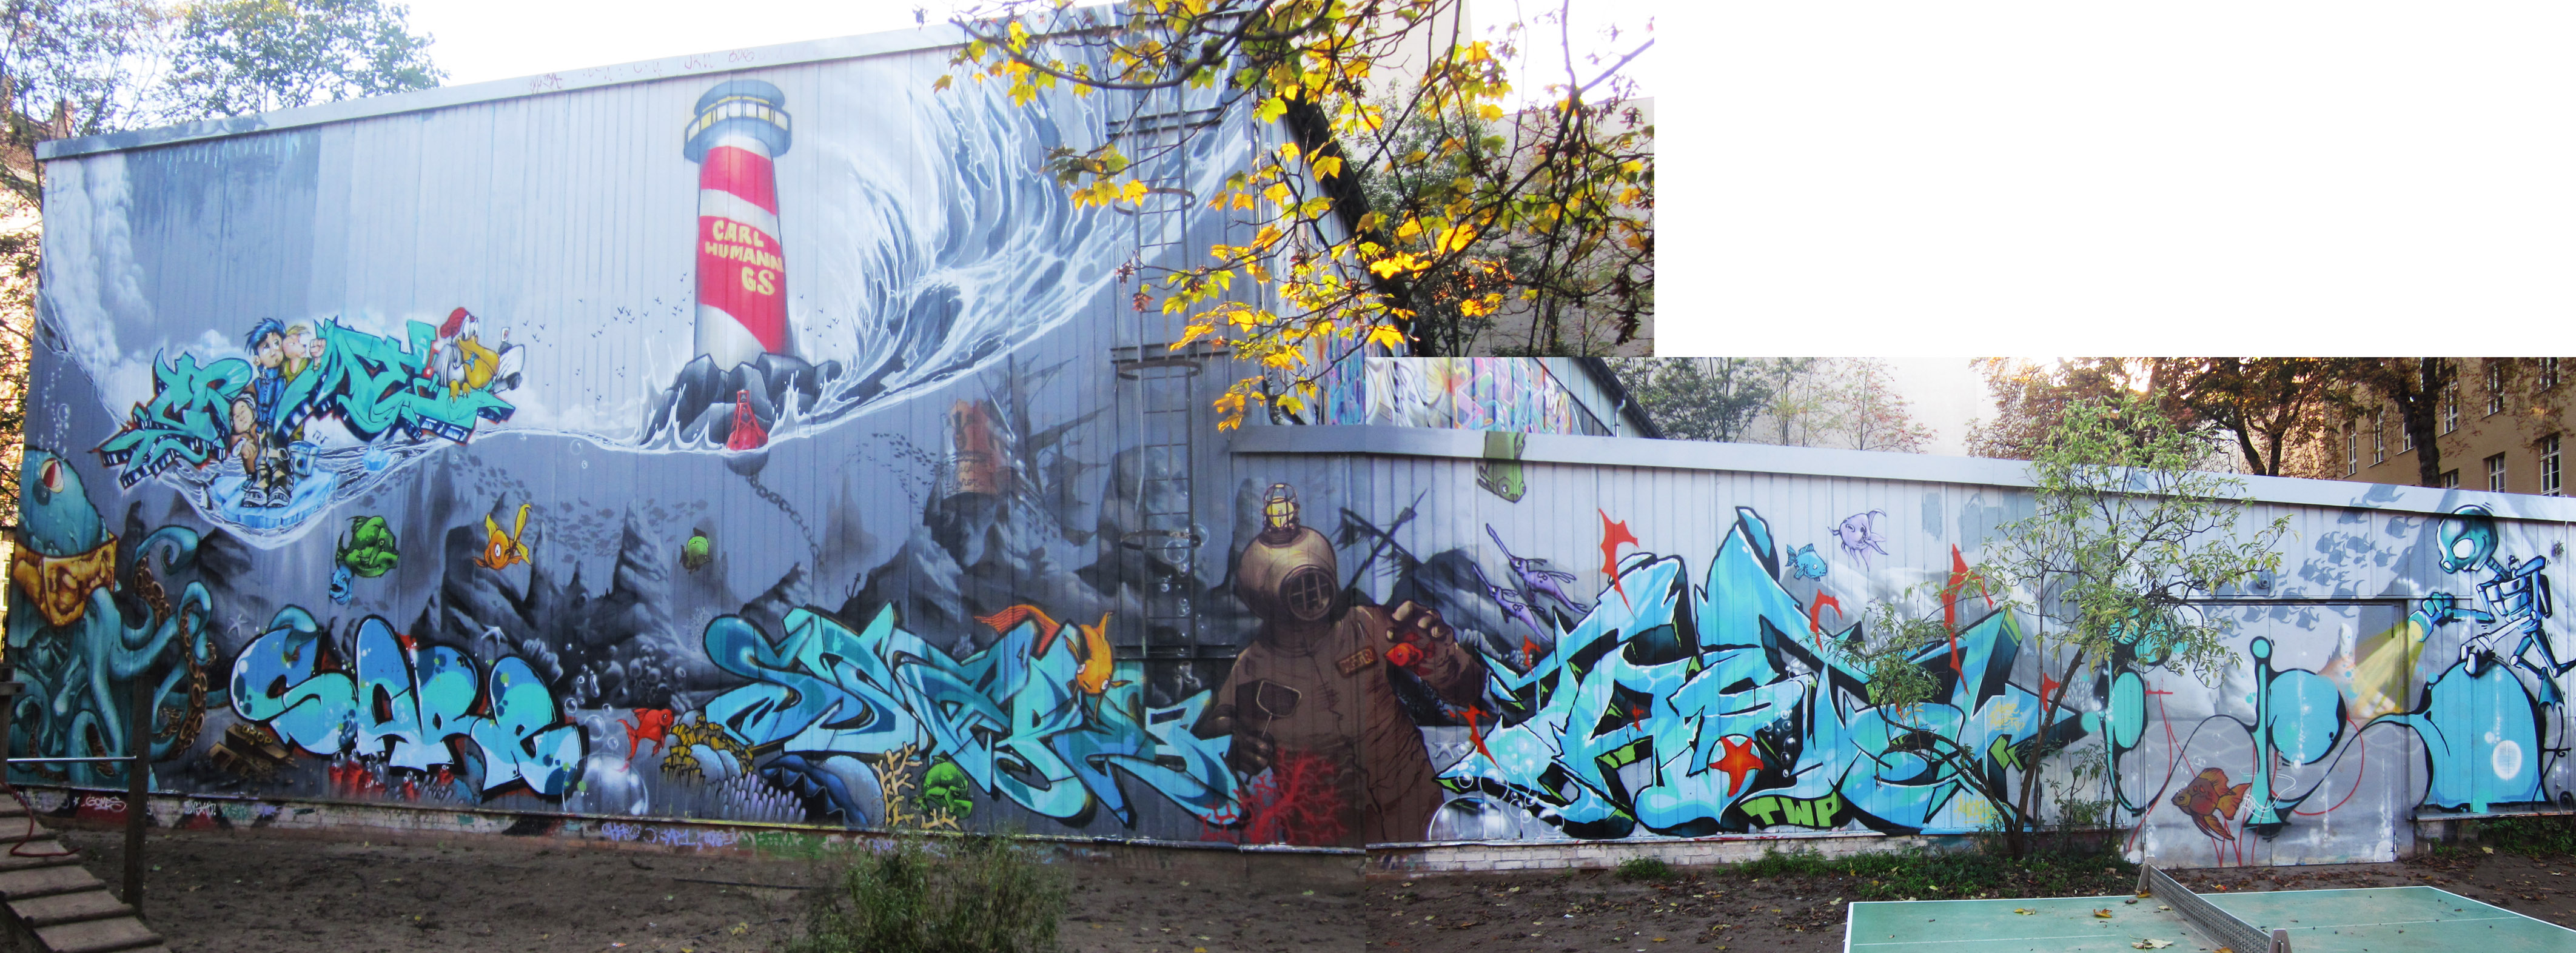 graffiti lobby berlin carl humann grundschule. Black Bedroom Furniture Sets. Home Design Ideas